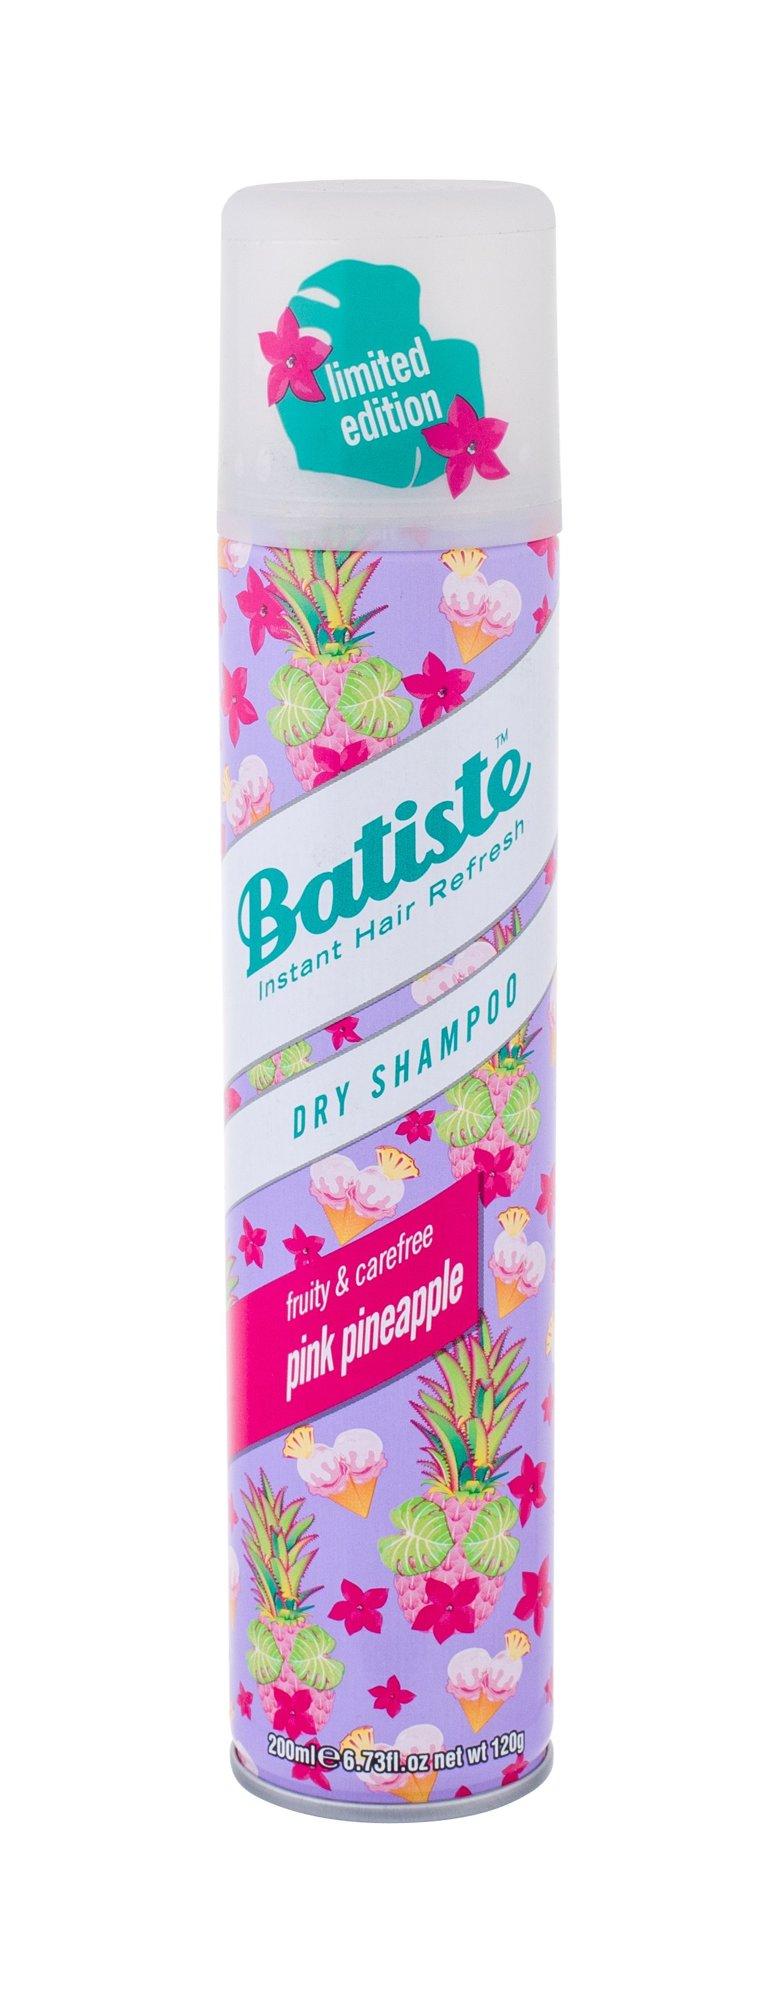 Batiste Pink Pineapple Dry Shampoo 200ml